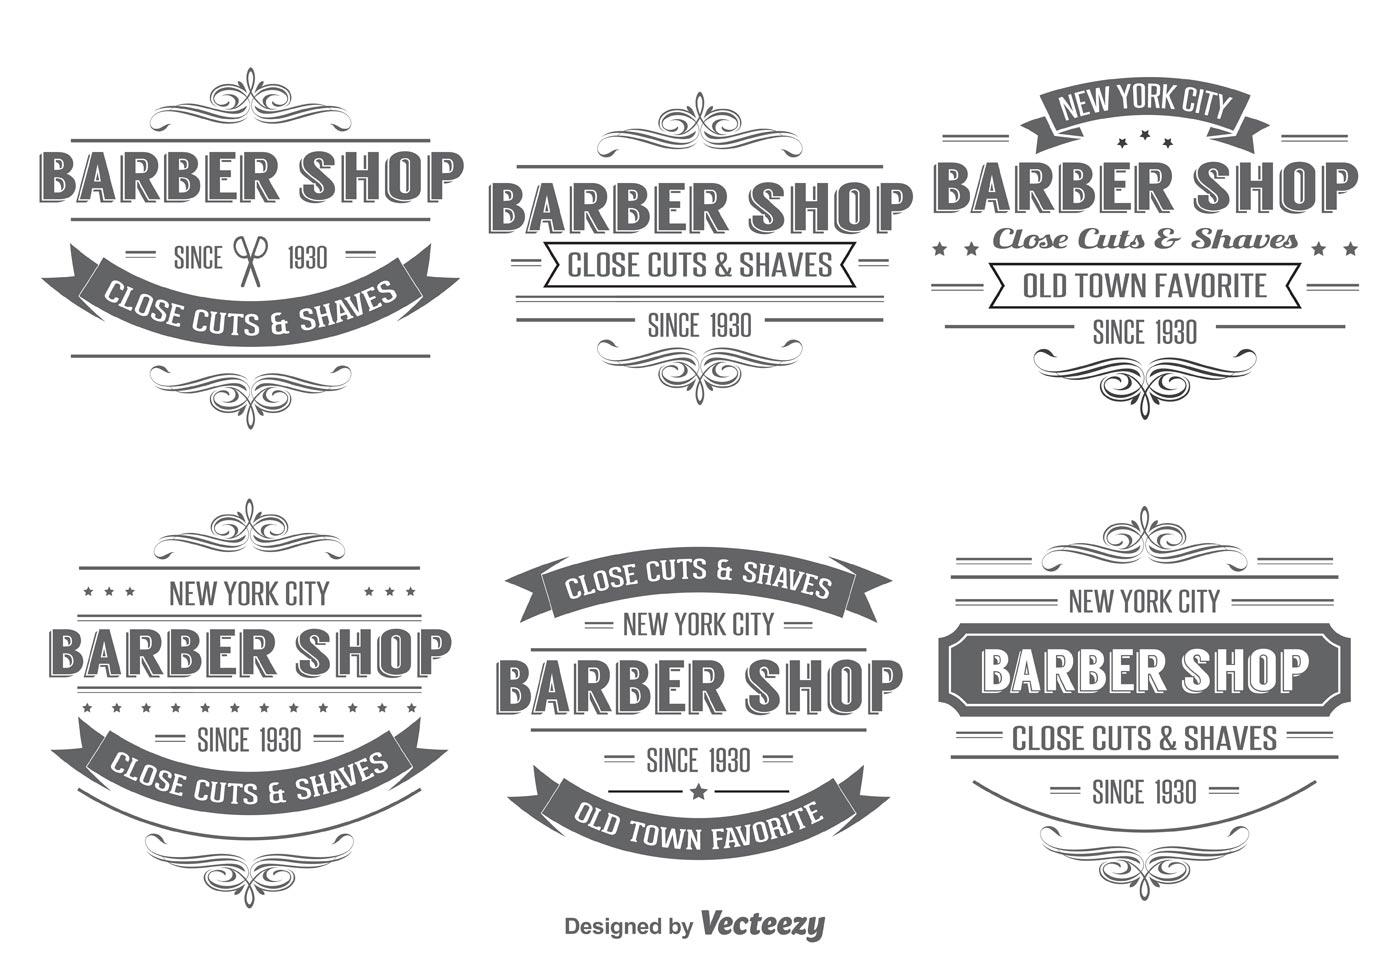 Barber Shop Free Vector Art 2092 Free Downloads